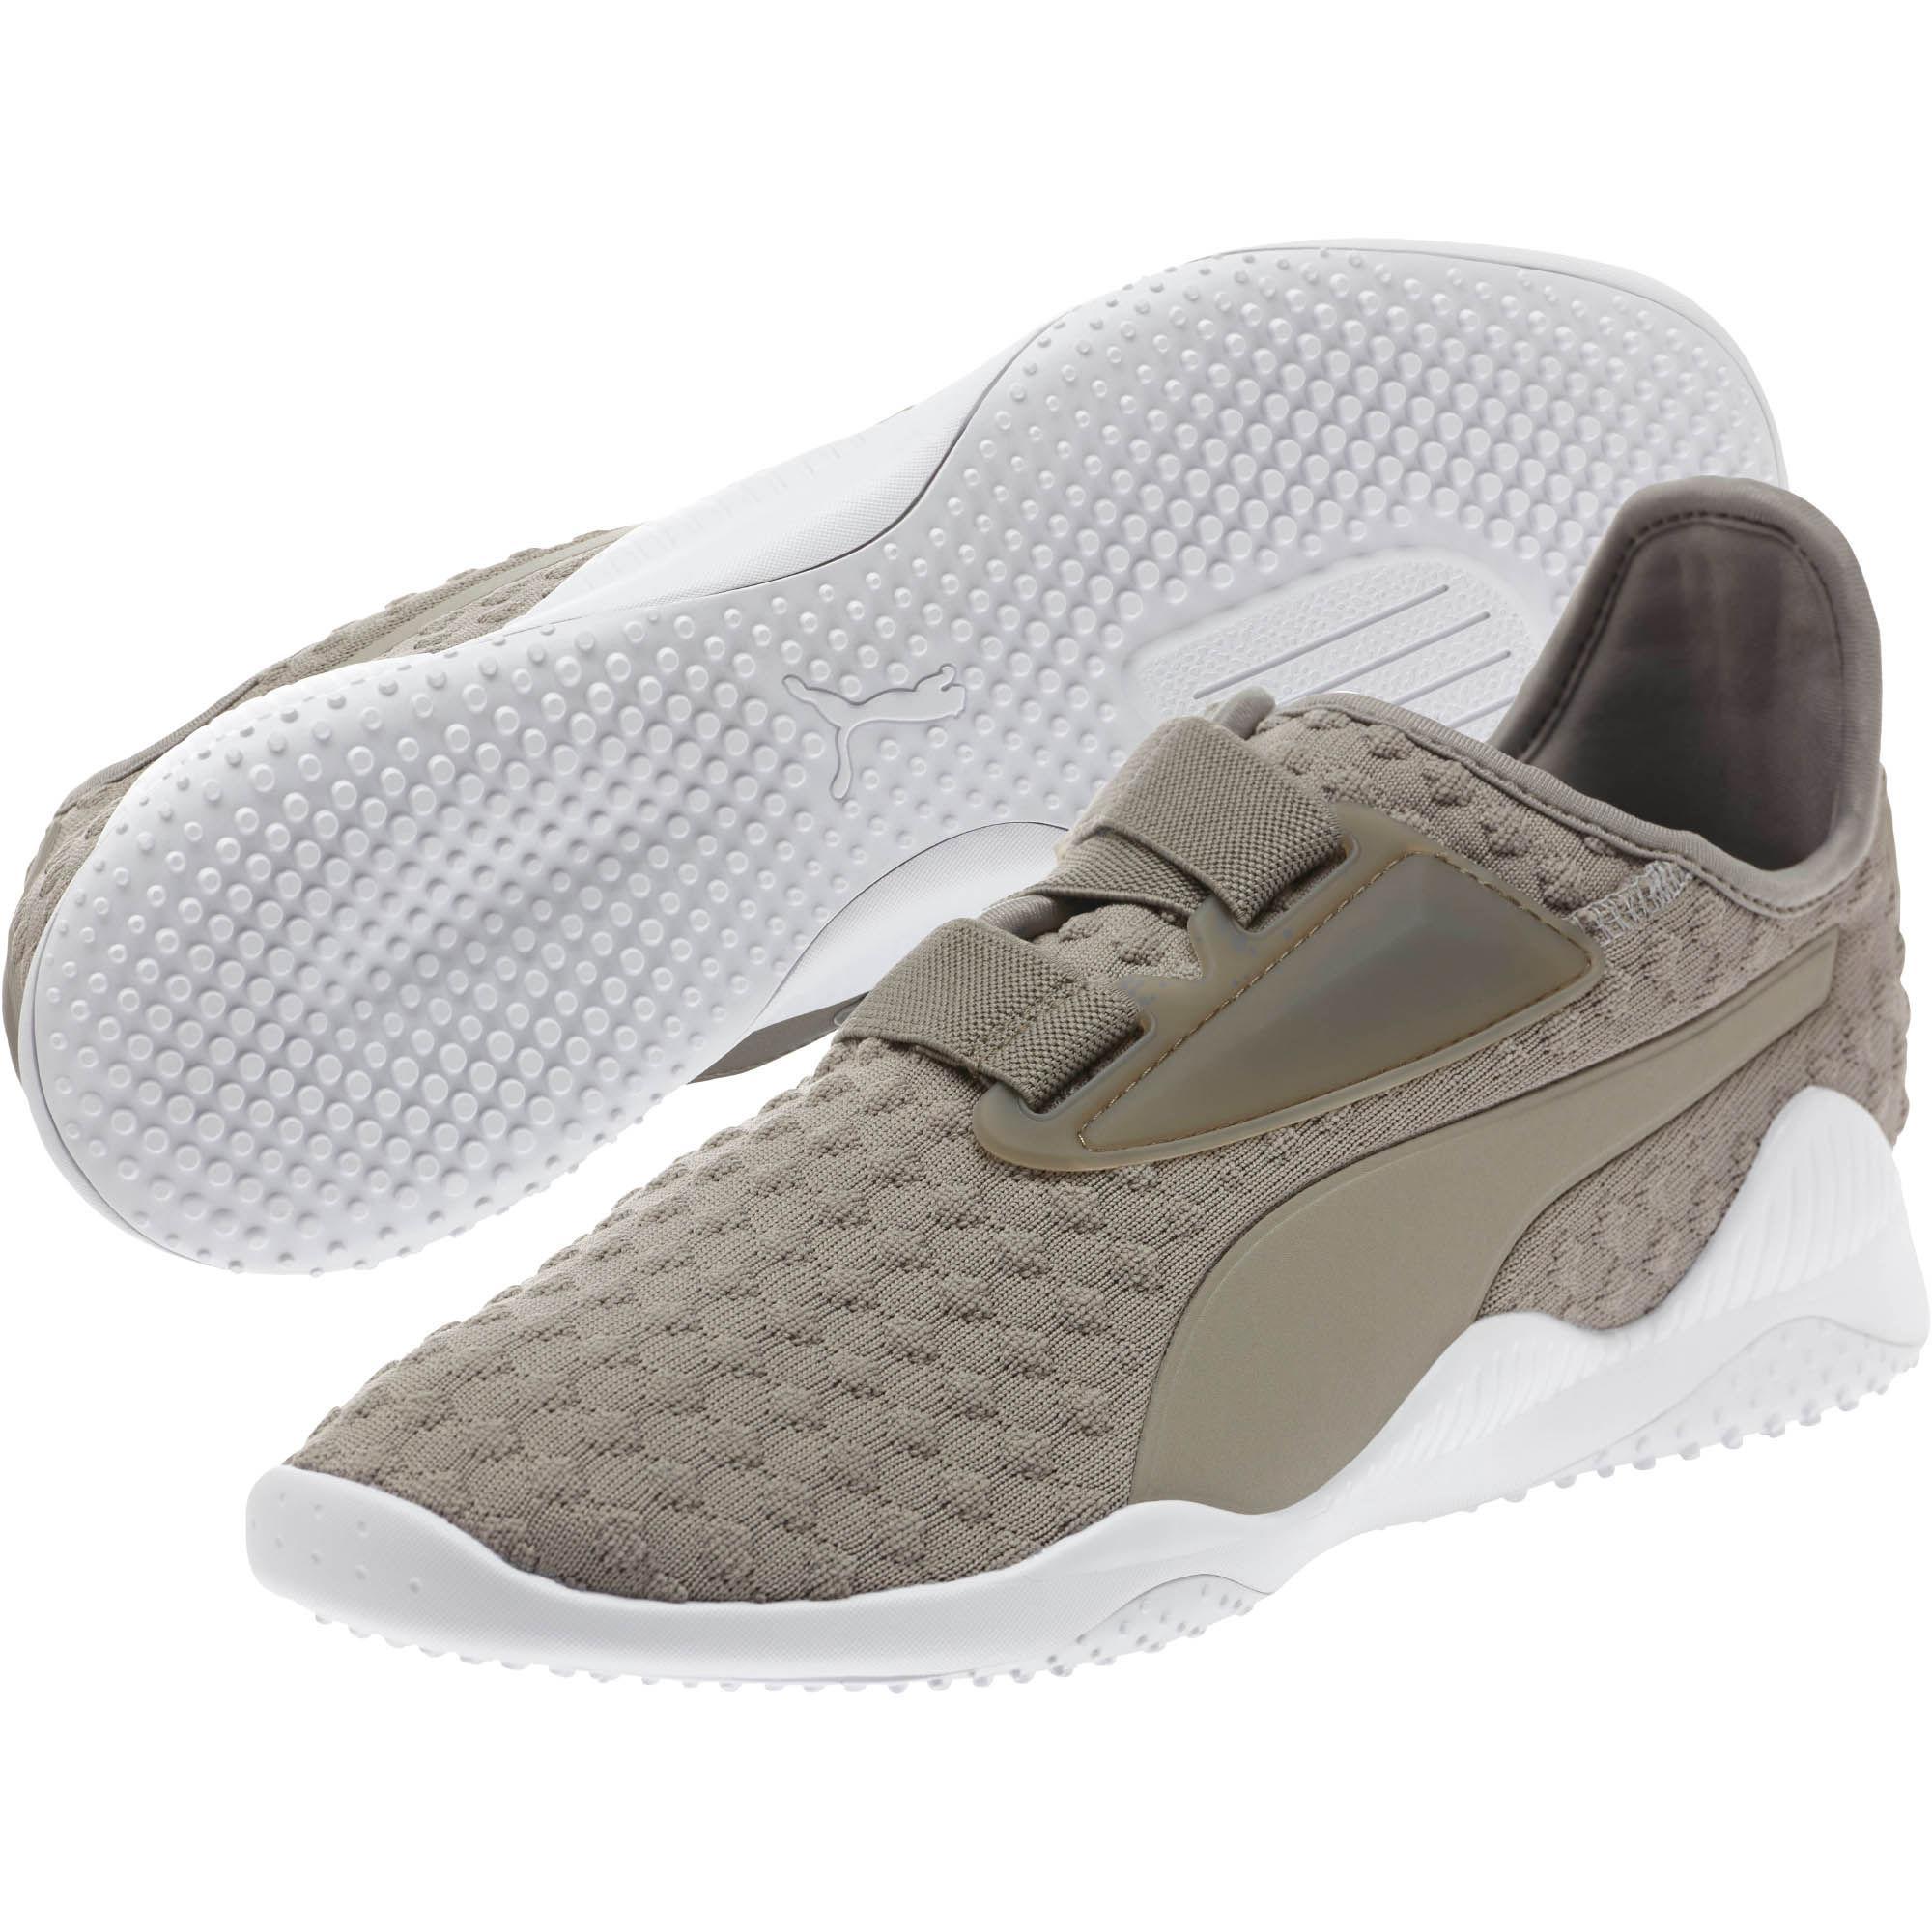 5d9b529741 PUMA Mostro Bubble Knit Sneakers for Men - Lyst